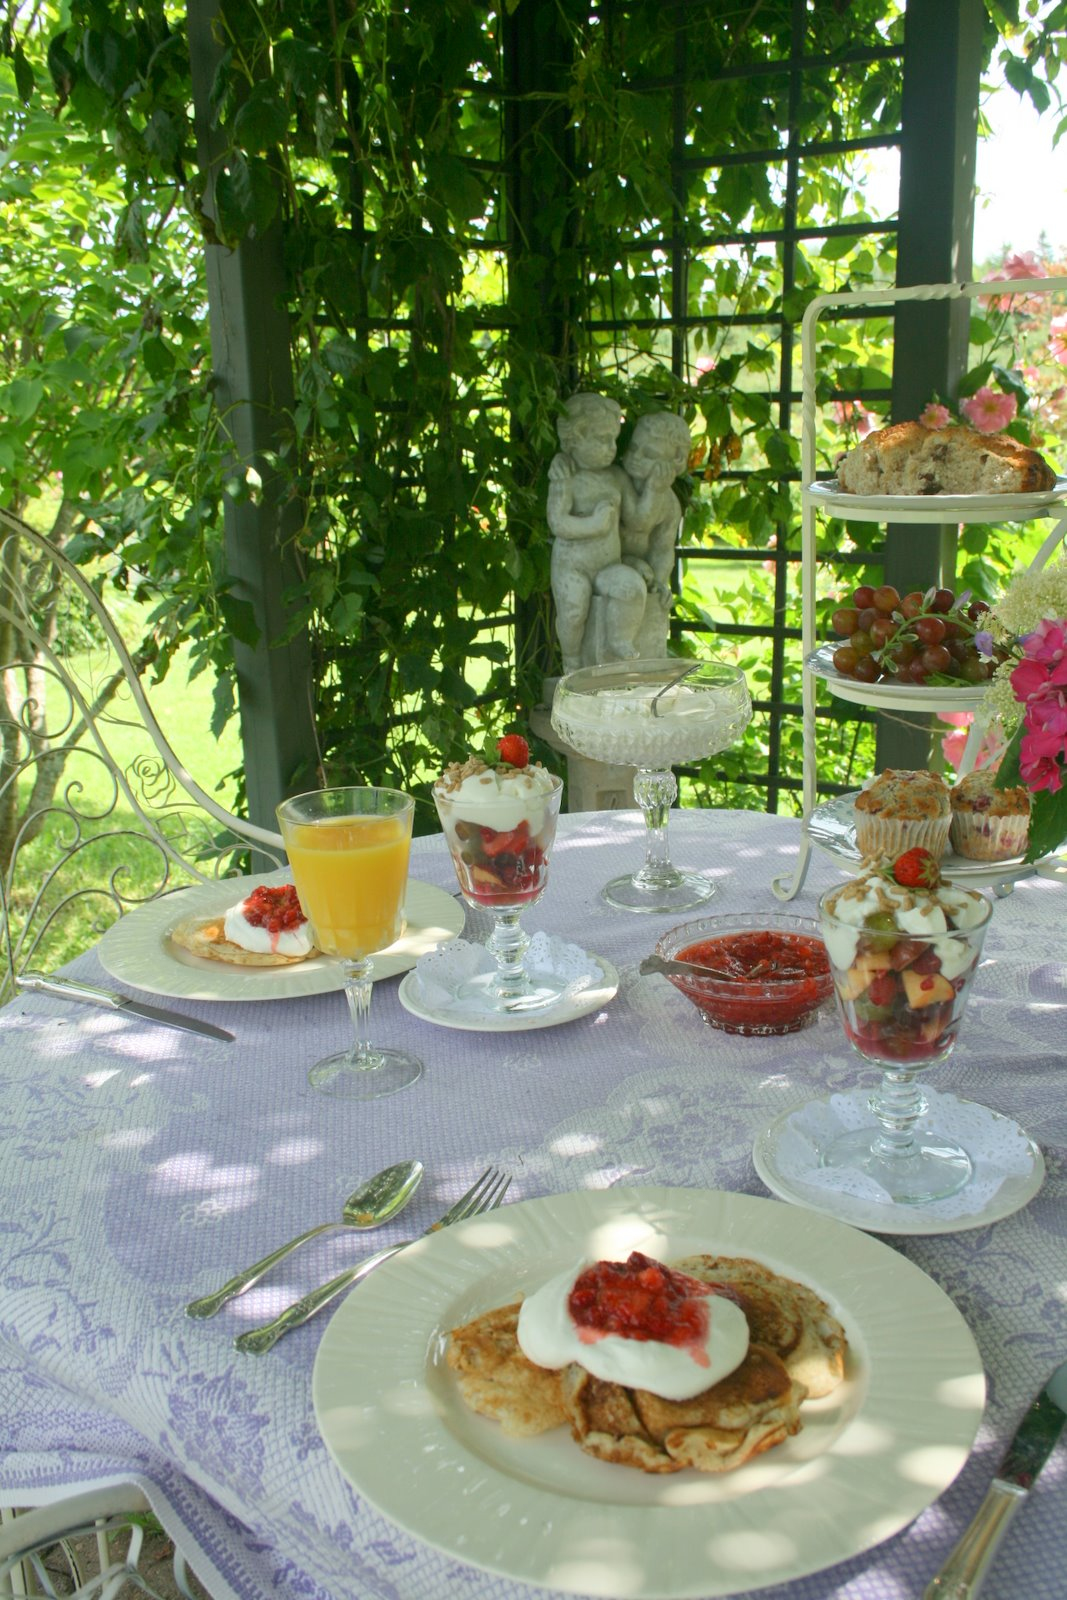 Aiken house gardens breakfast in the terrace for The terrace brunch